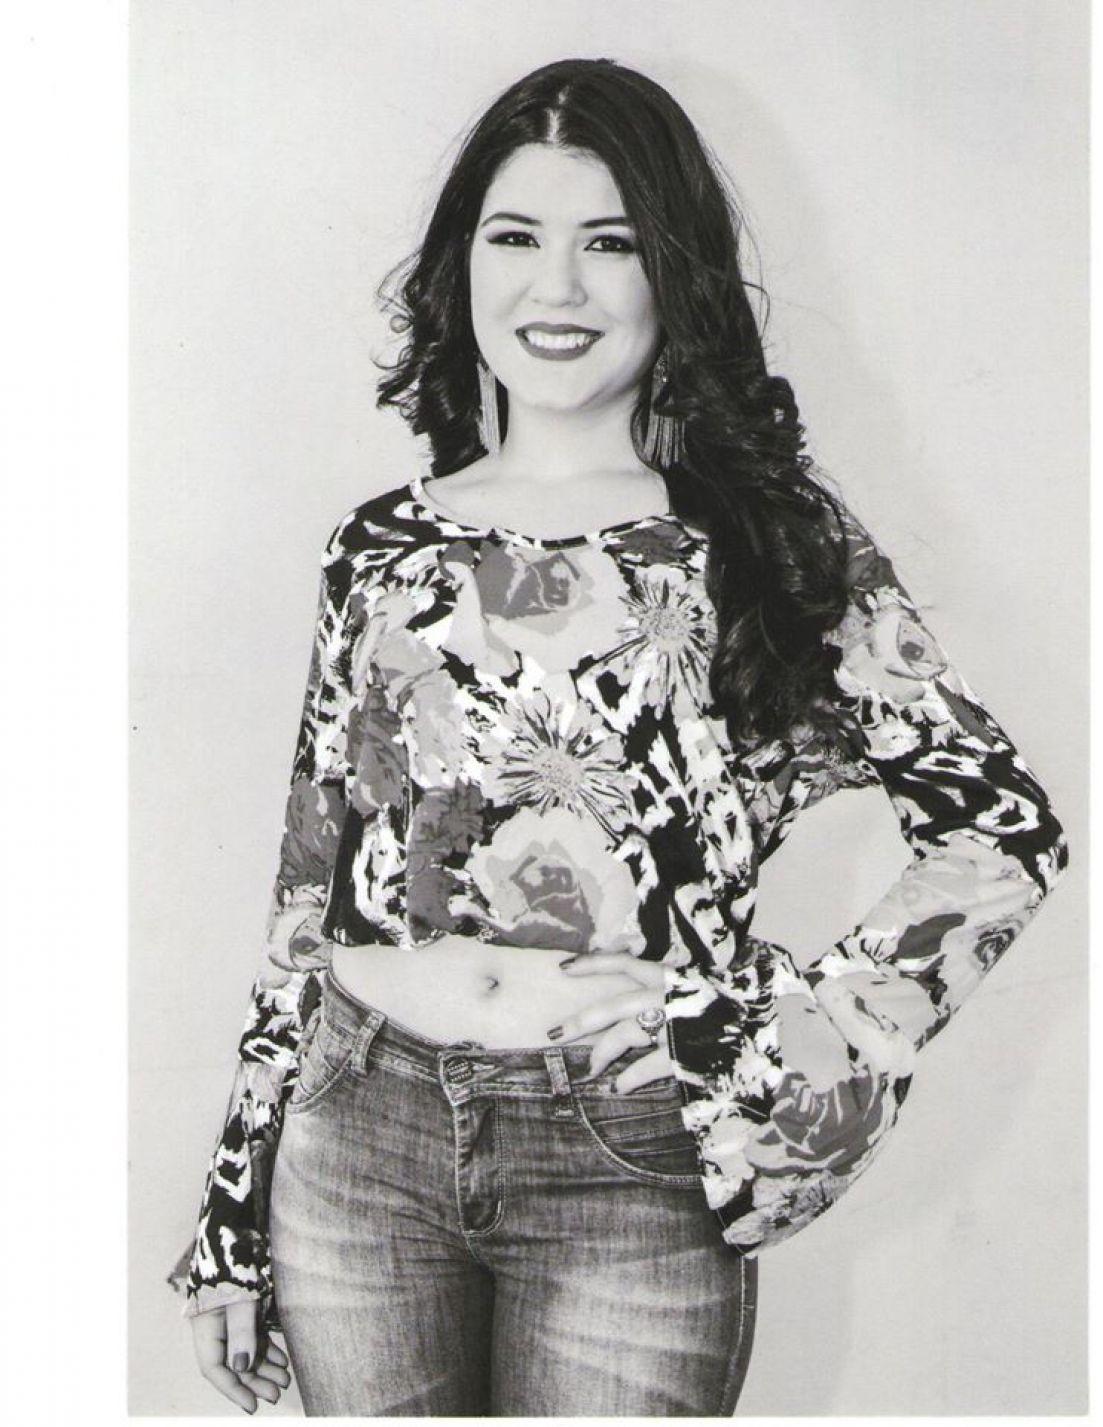 Nicole Soares da Silva - 17 Anos - Representa: Zuppy Bijuter